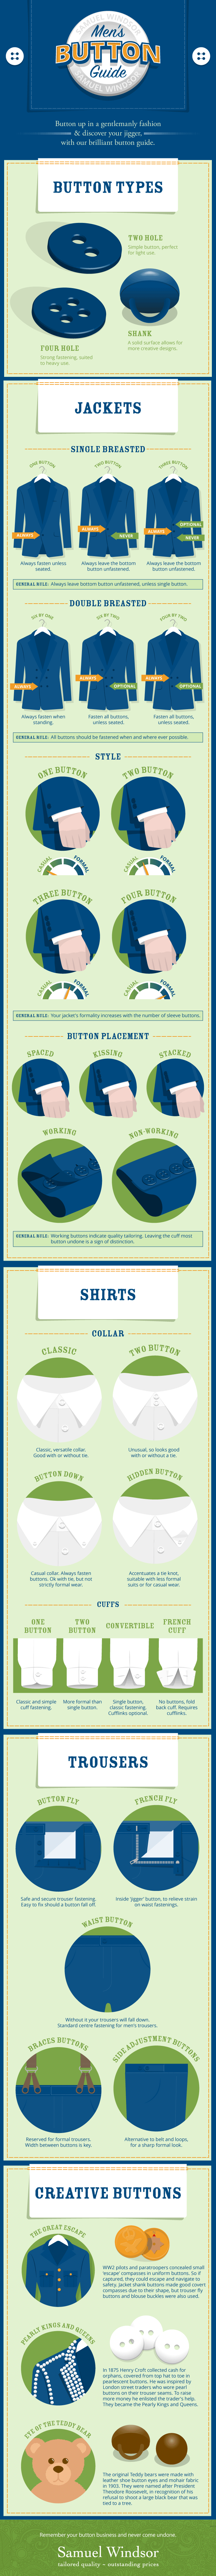 Men's Button Guide